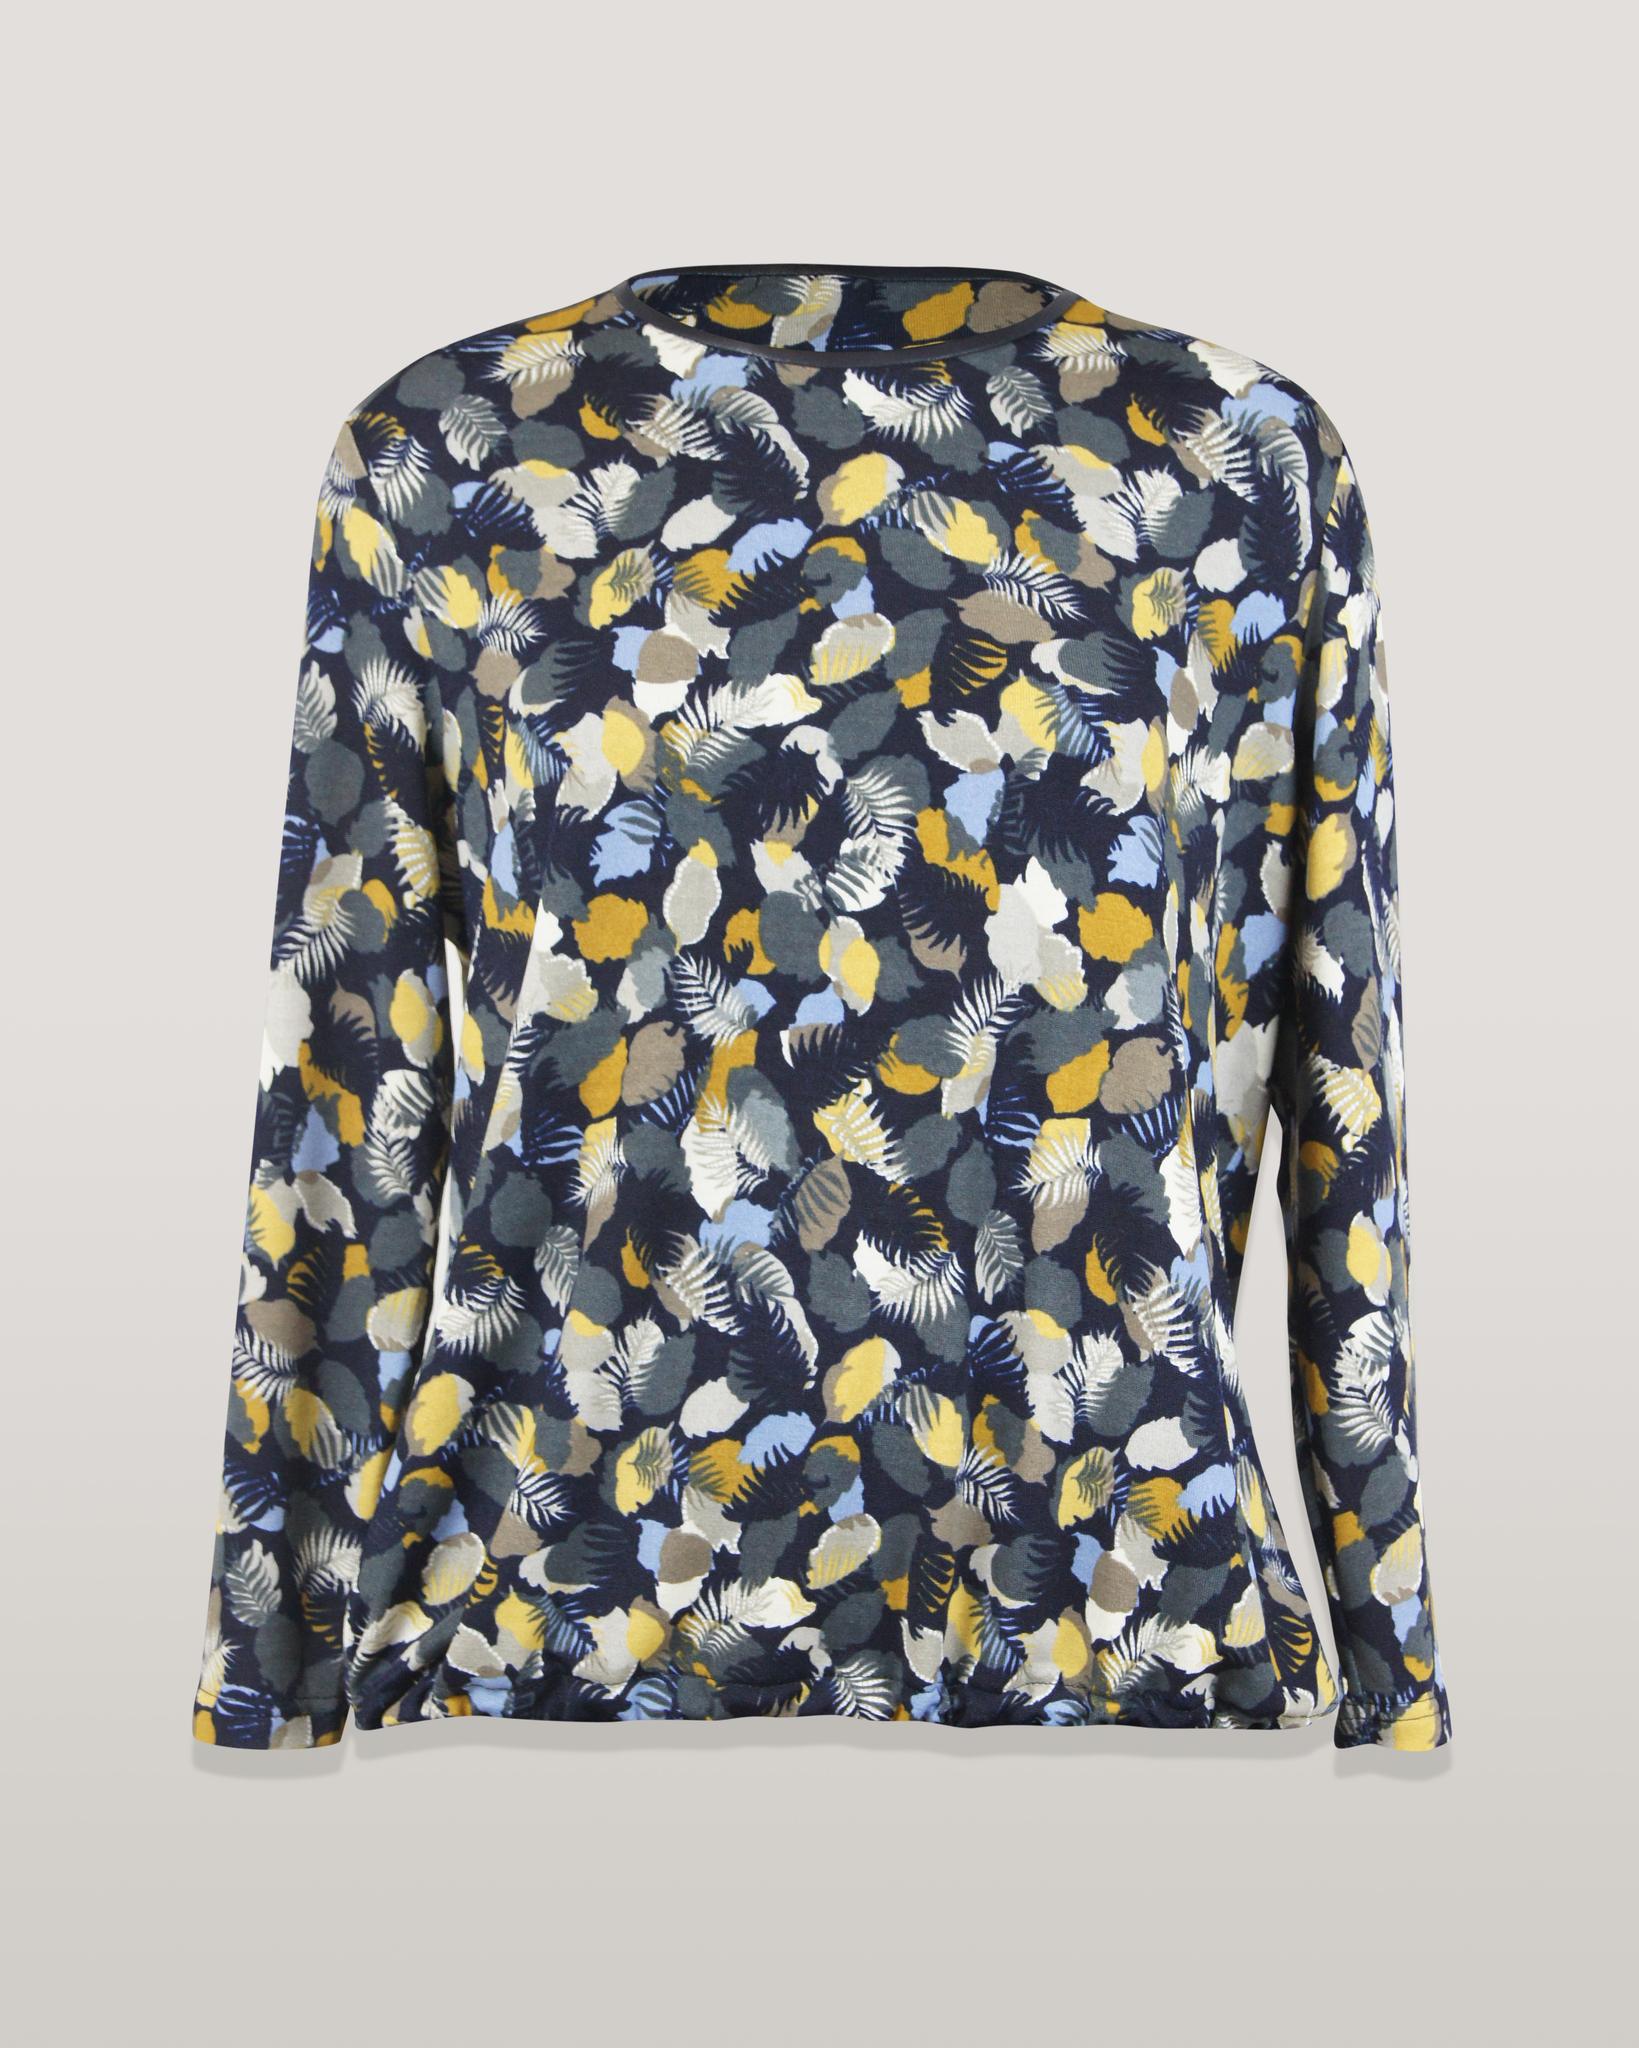 Блузка Ibis 7923 перышки акварель